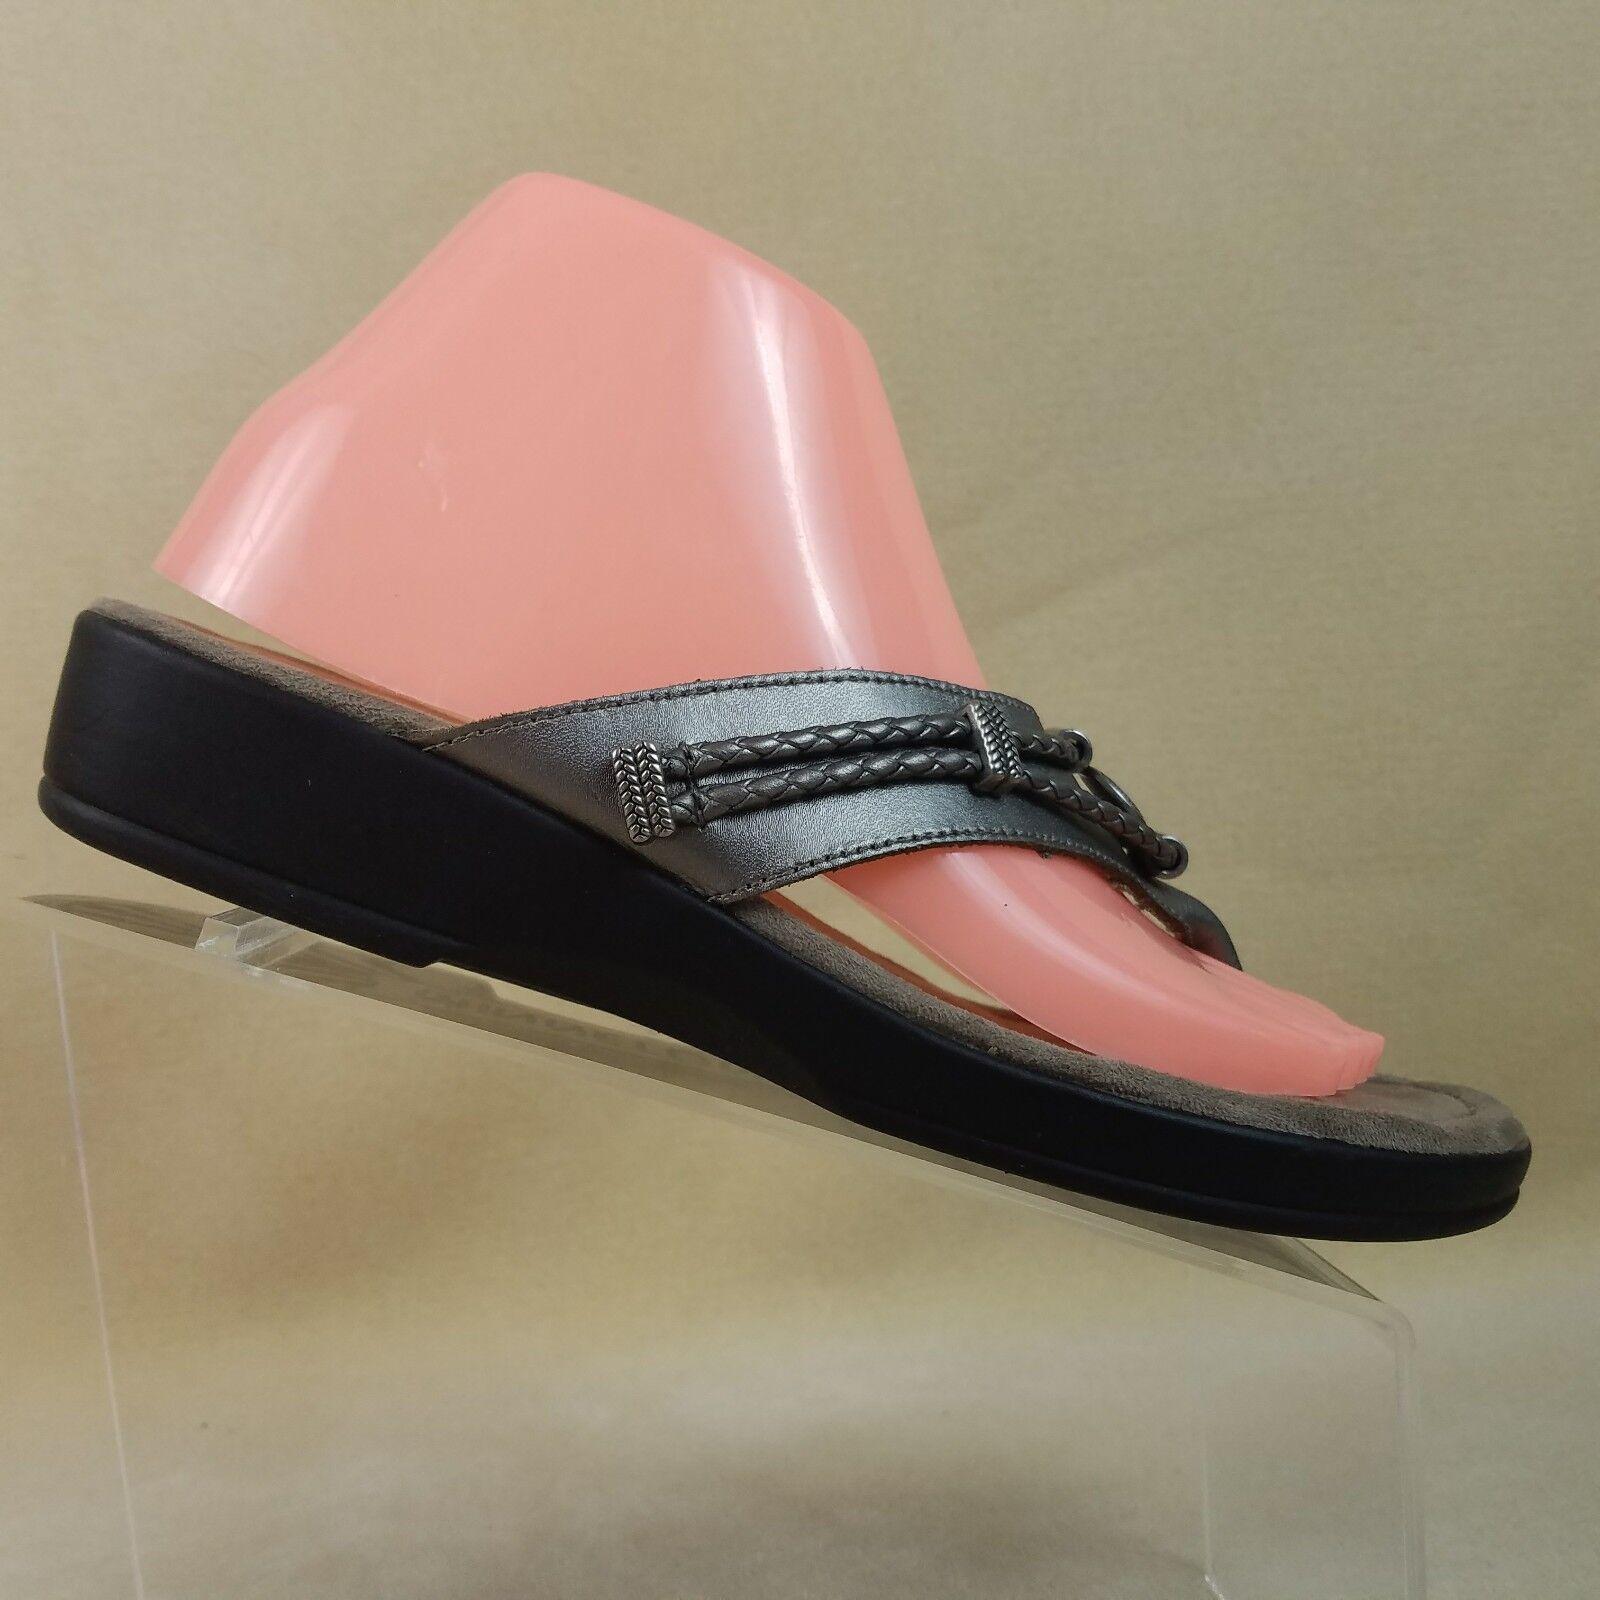 Minnetonka Womens Pewter Leather Silver Metallic Sandals Flip Flop Size 8 #E64